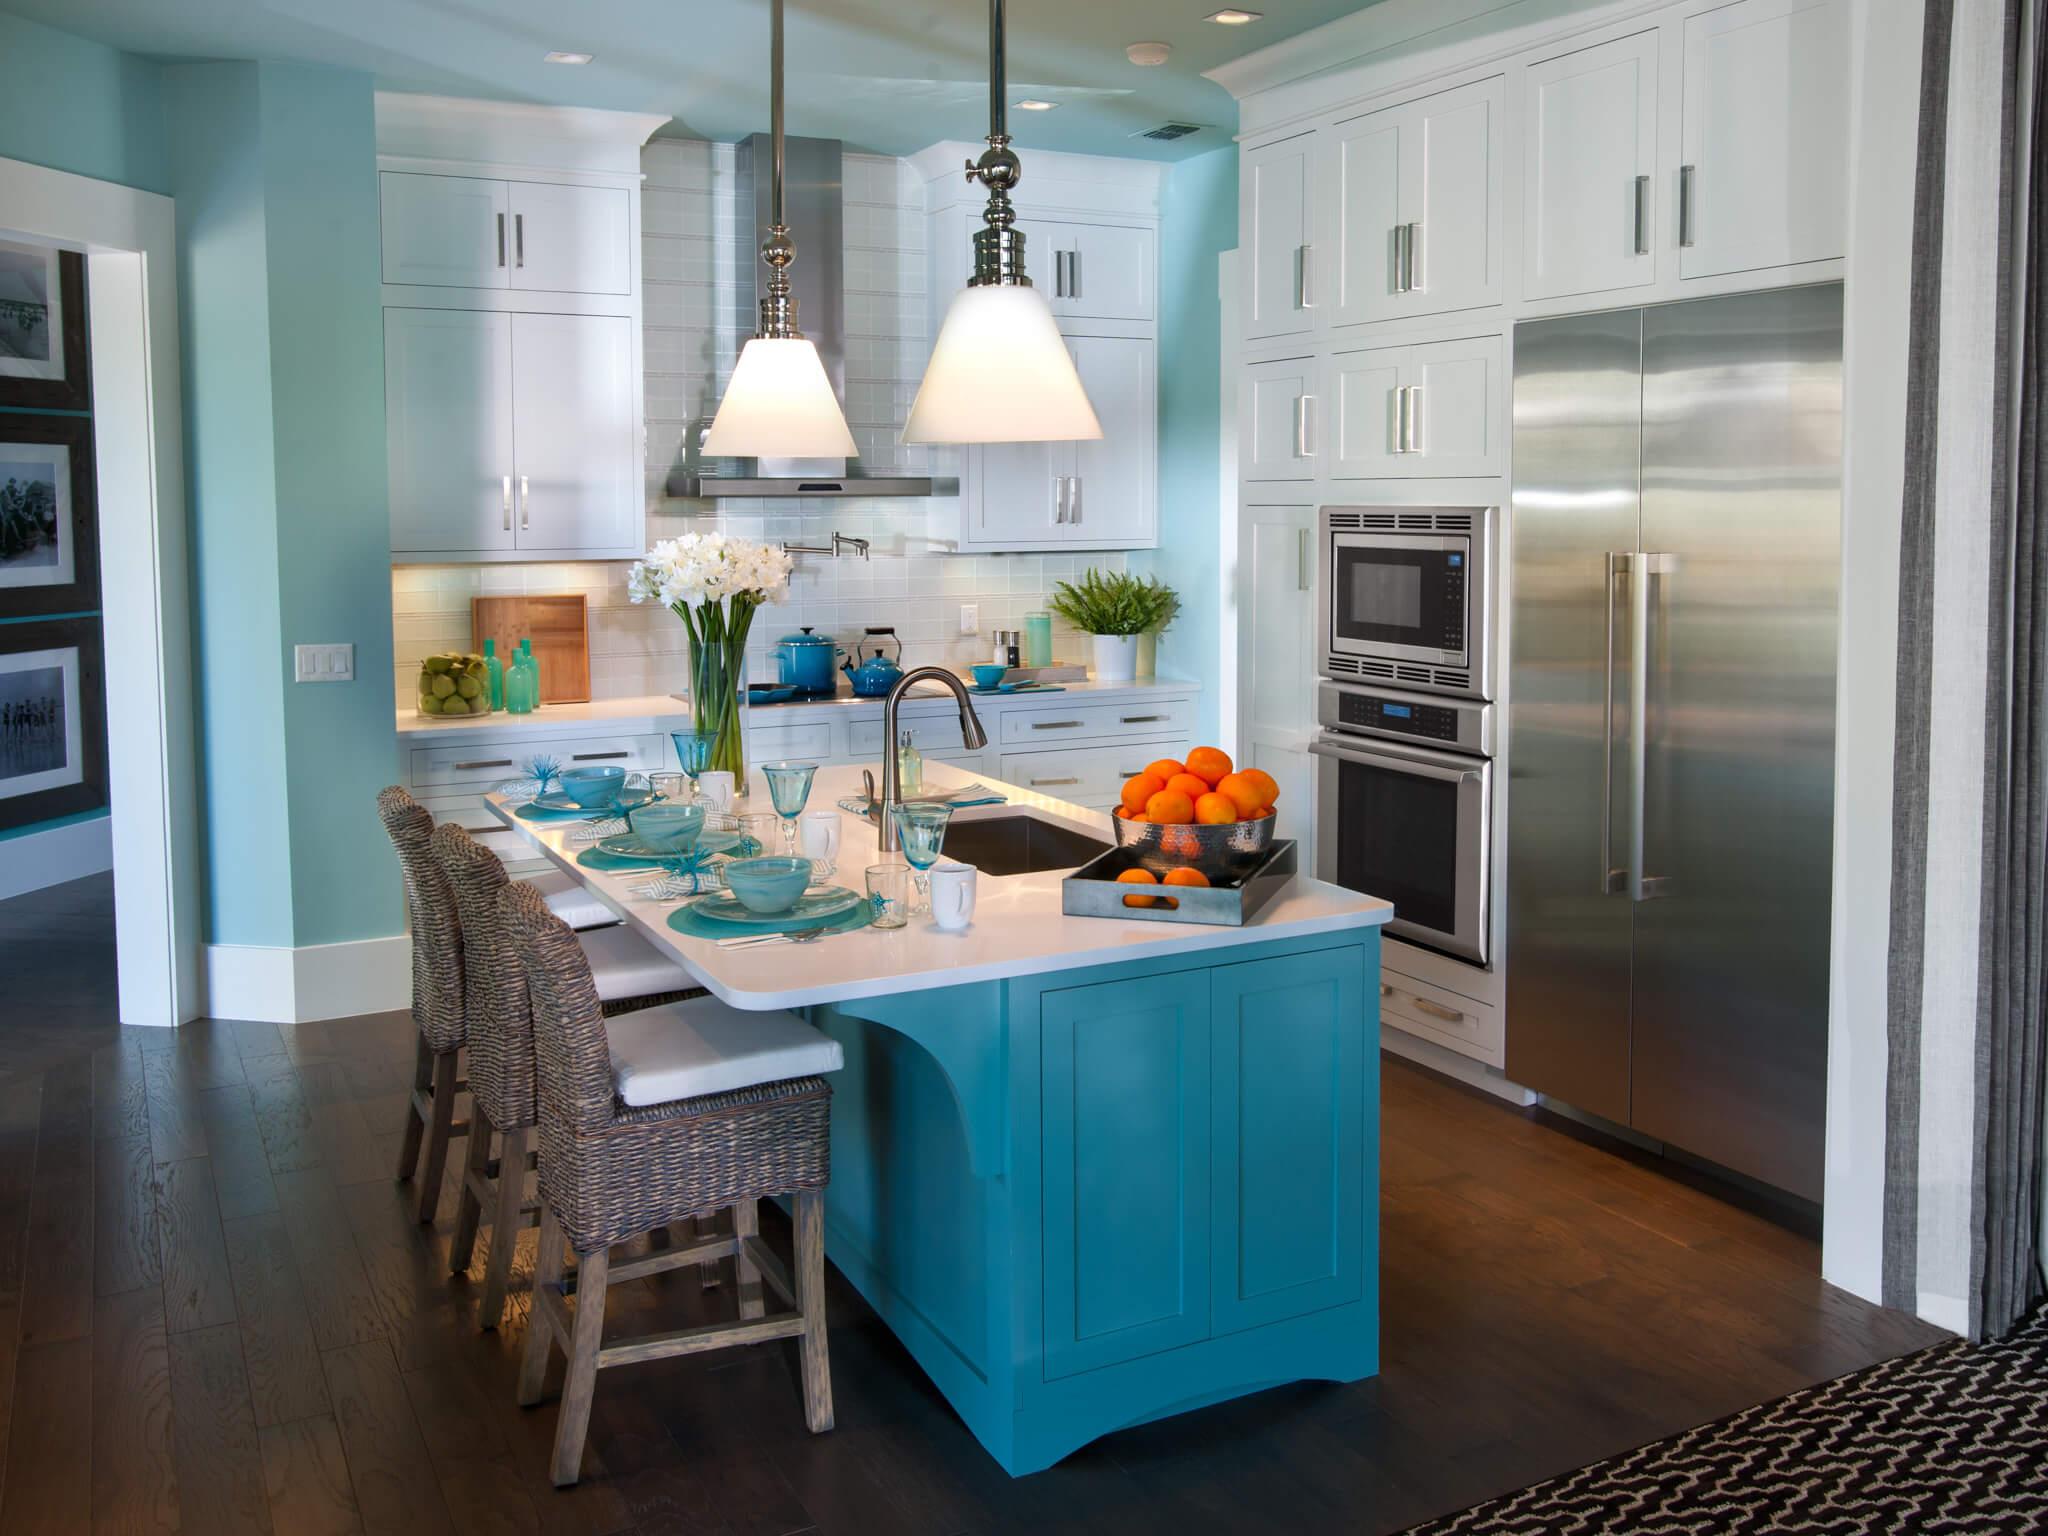 affordable-kitchen-theme-ideas-in-decor-ideas-for-kitchen-mesmerizing-kitchen-decorations-ideas (1)